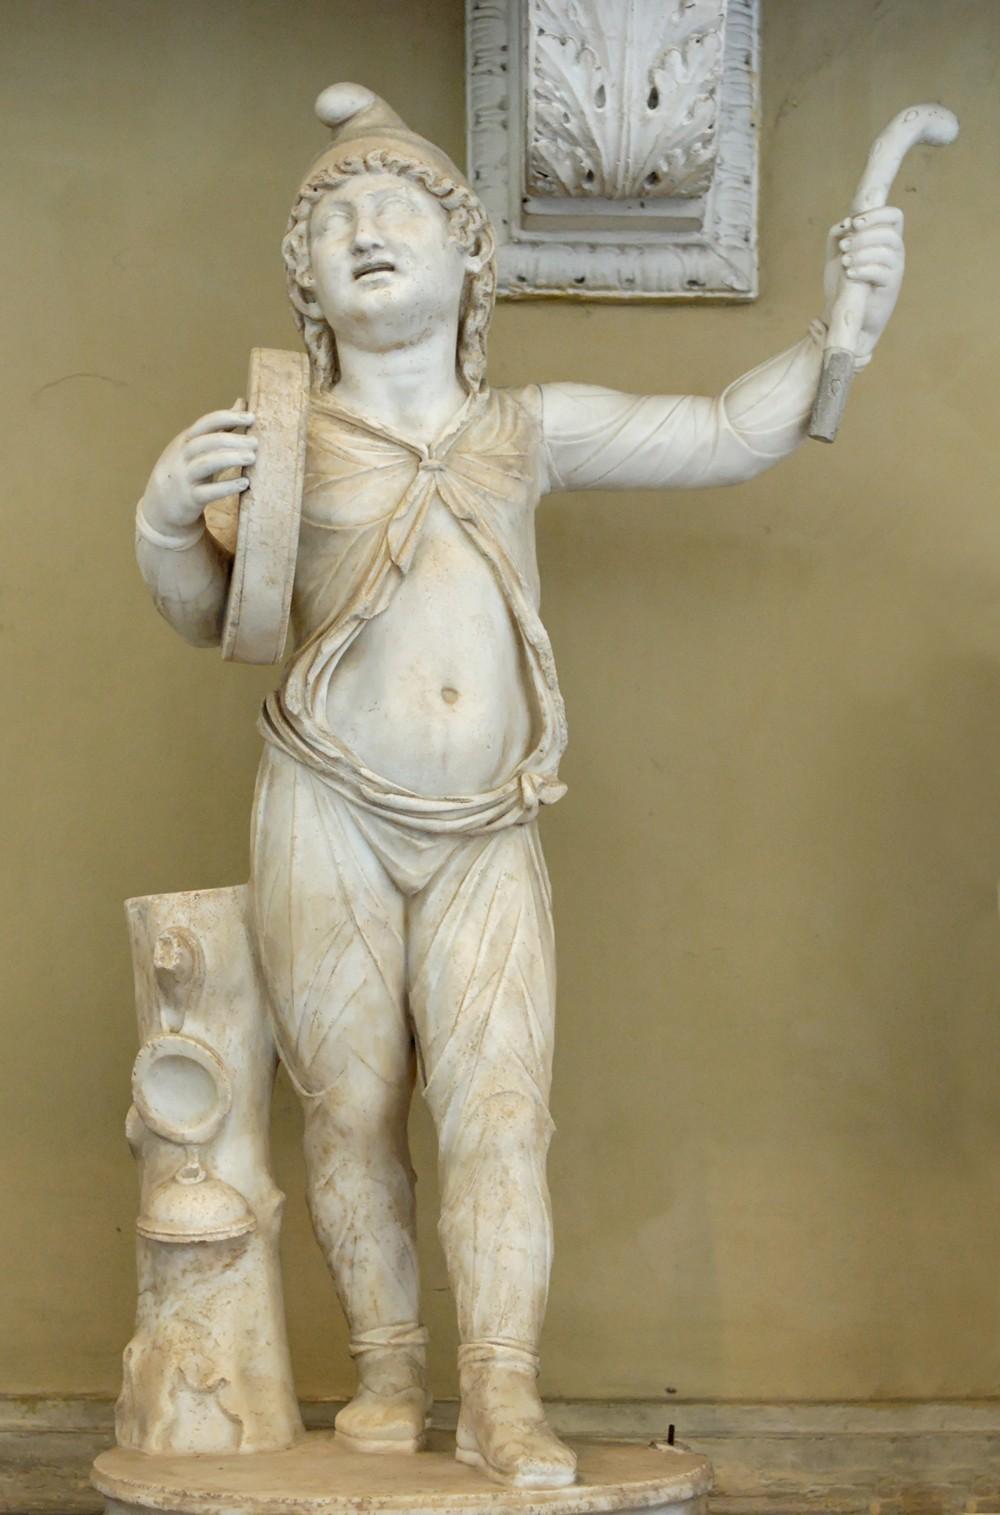 Roma, Palazzo Altieri, Attis Altieri Chiaramonti, Attis doet een dans uit de Sibillecultus (internet)